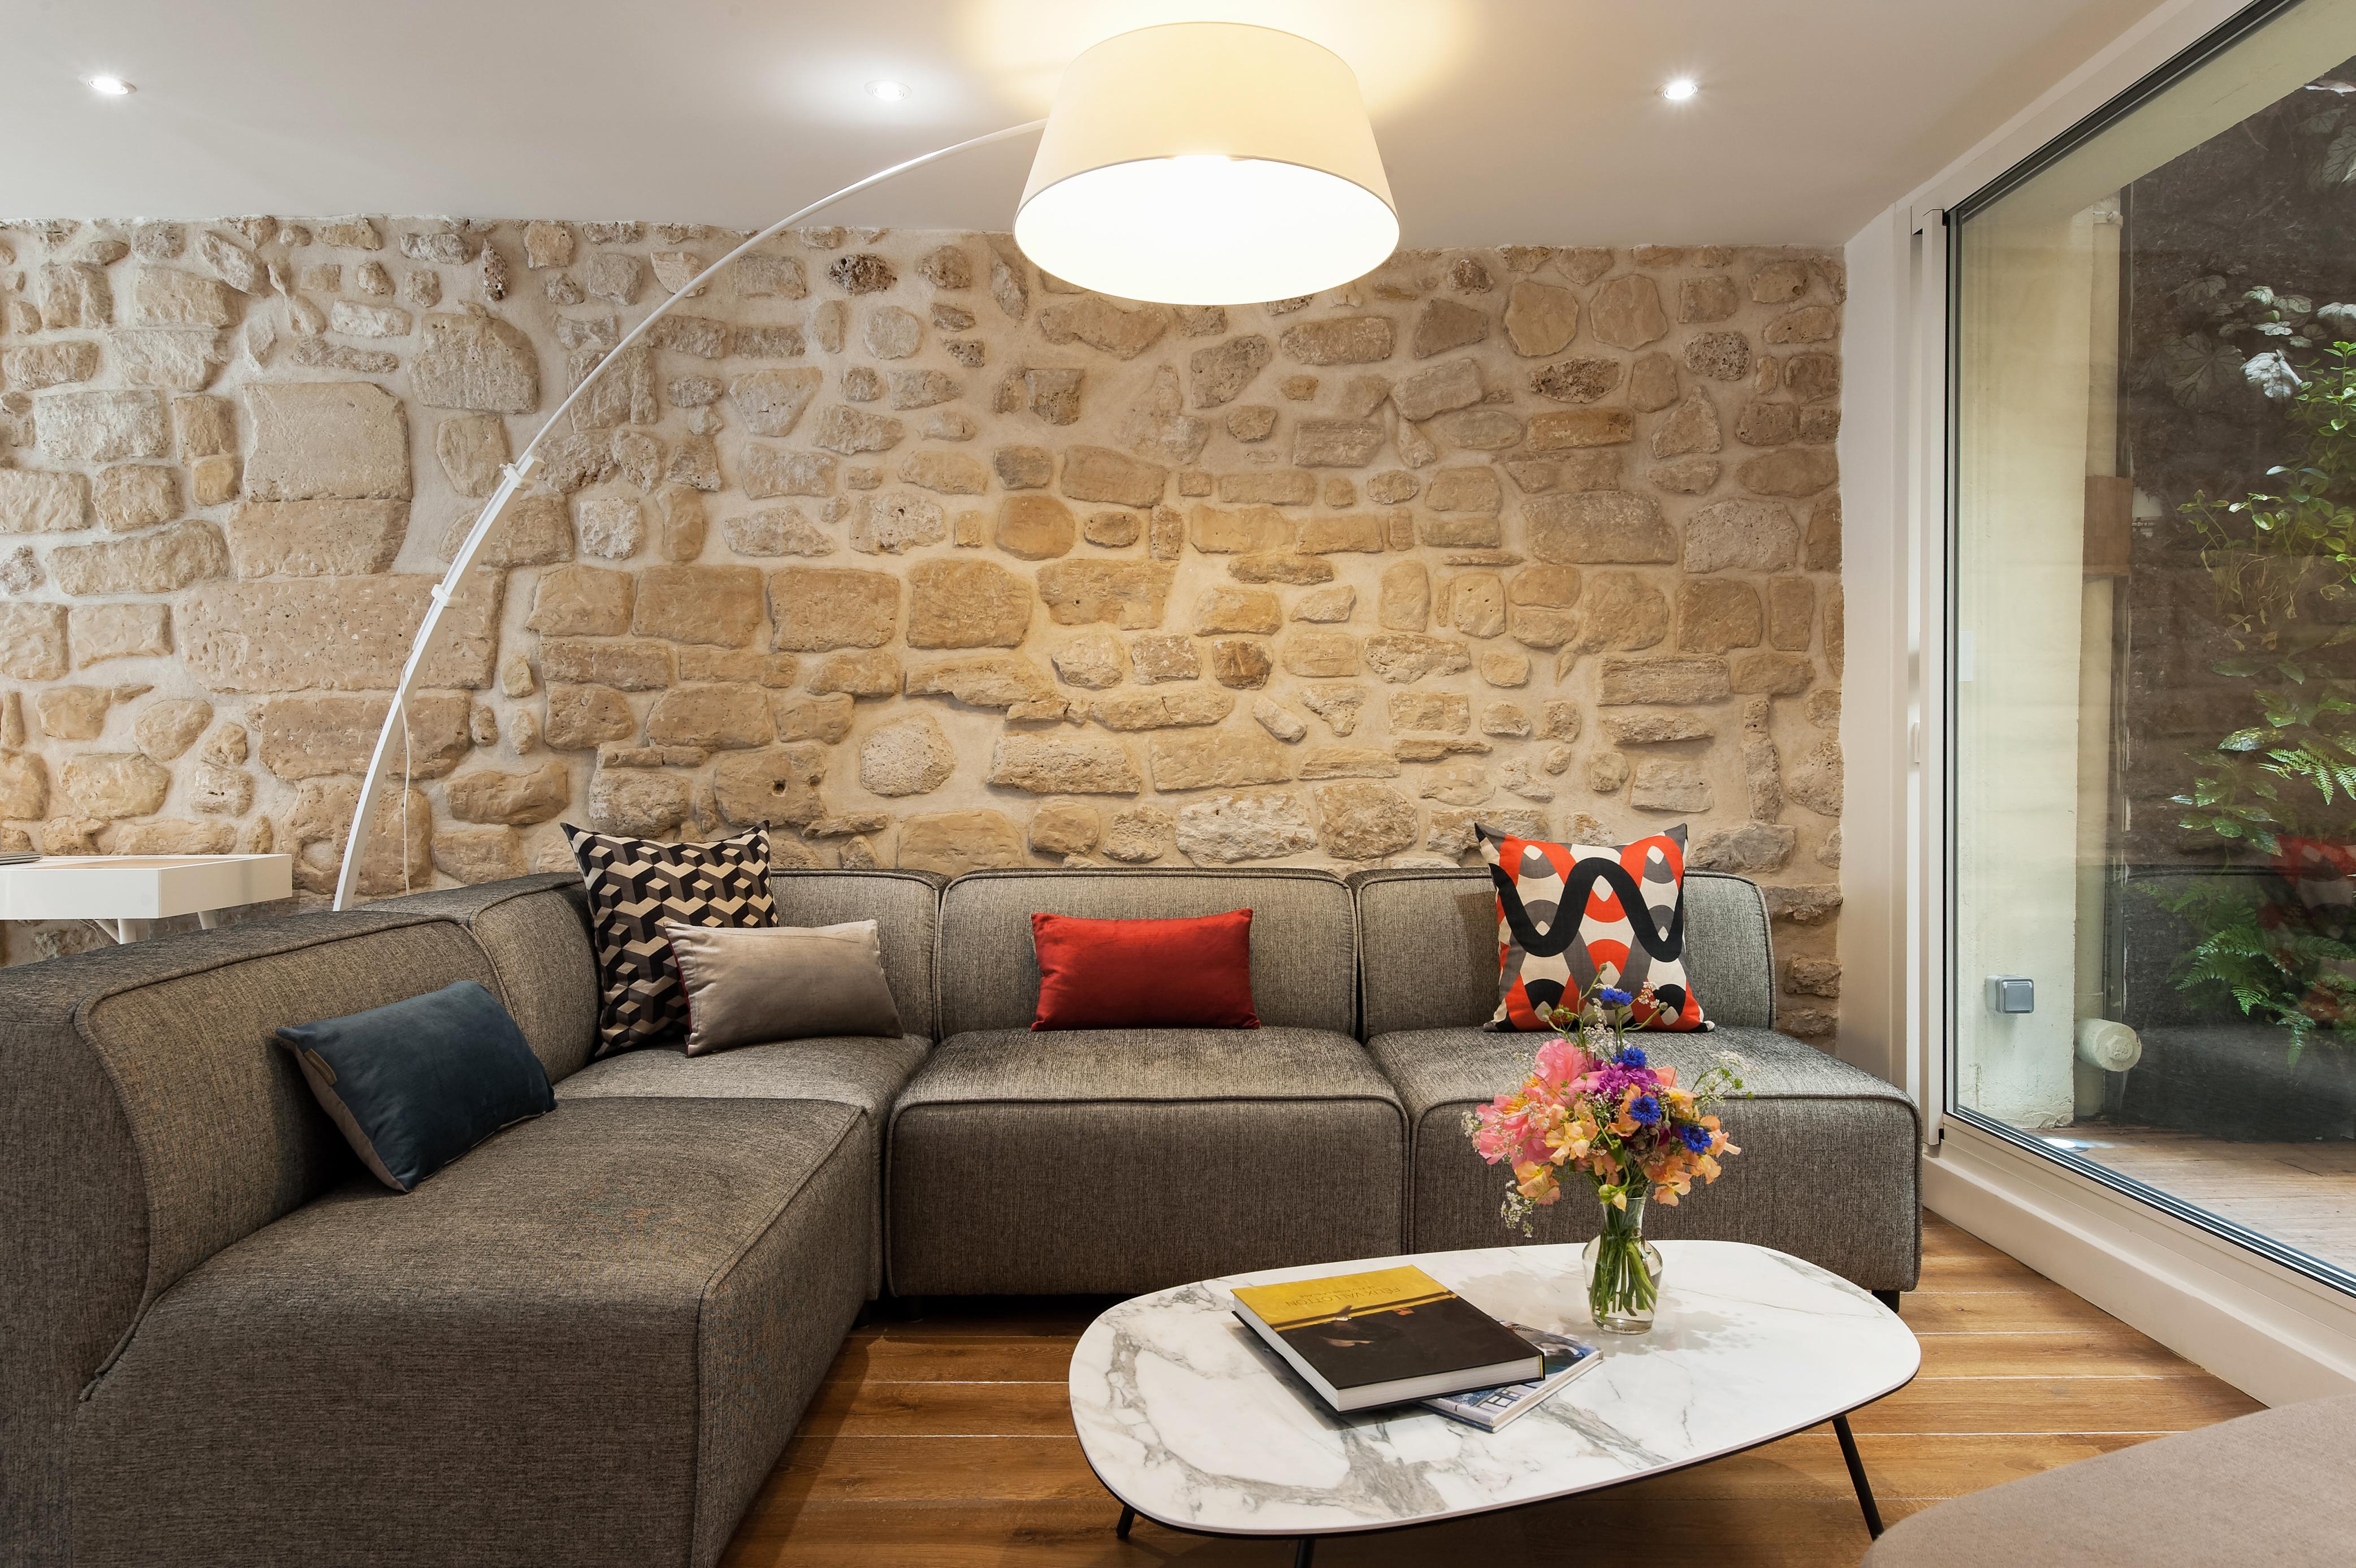 Paris Vacation Apartment Rental   Marais Garden Oasis   Haven in